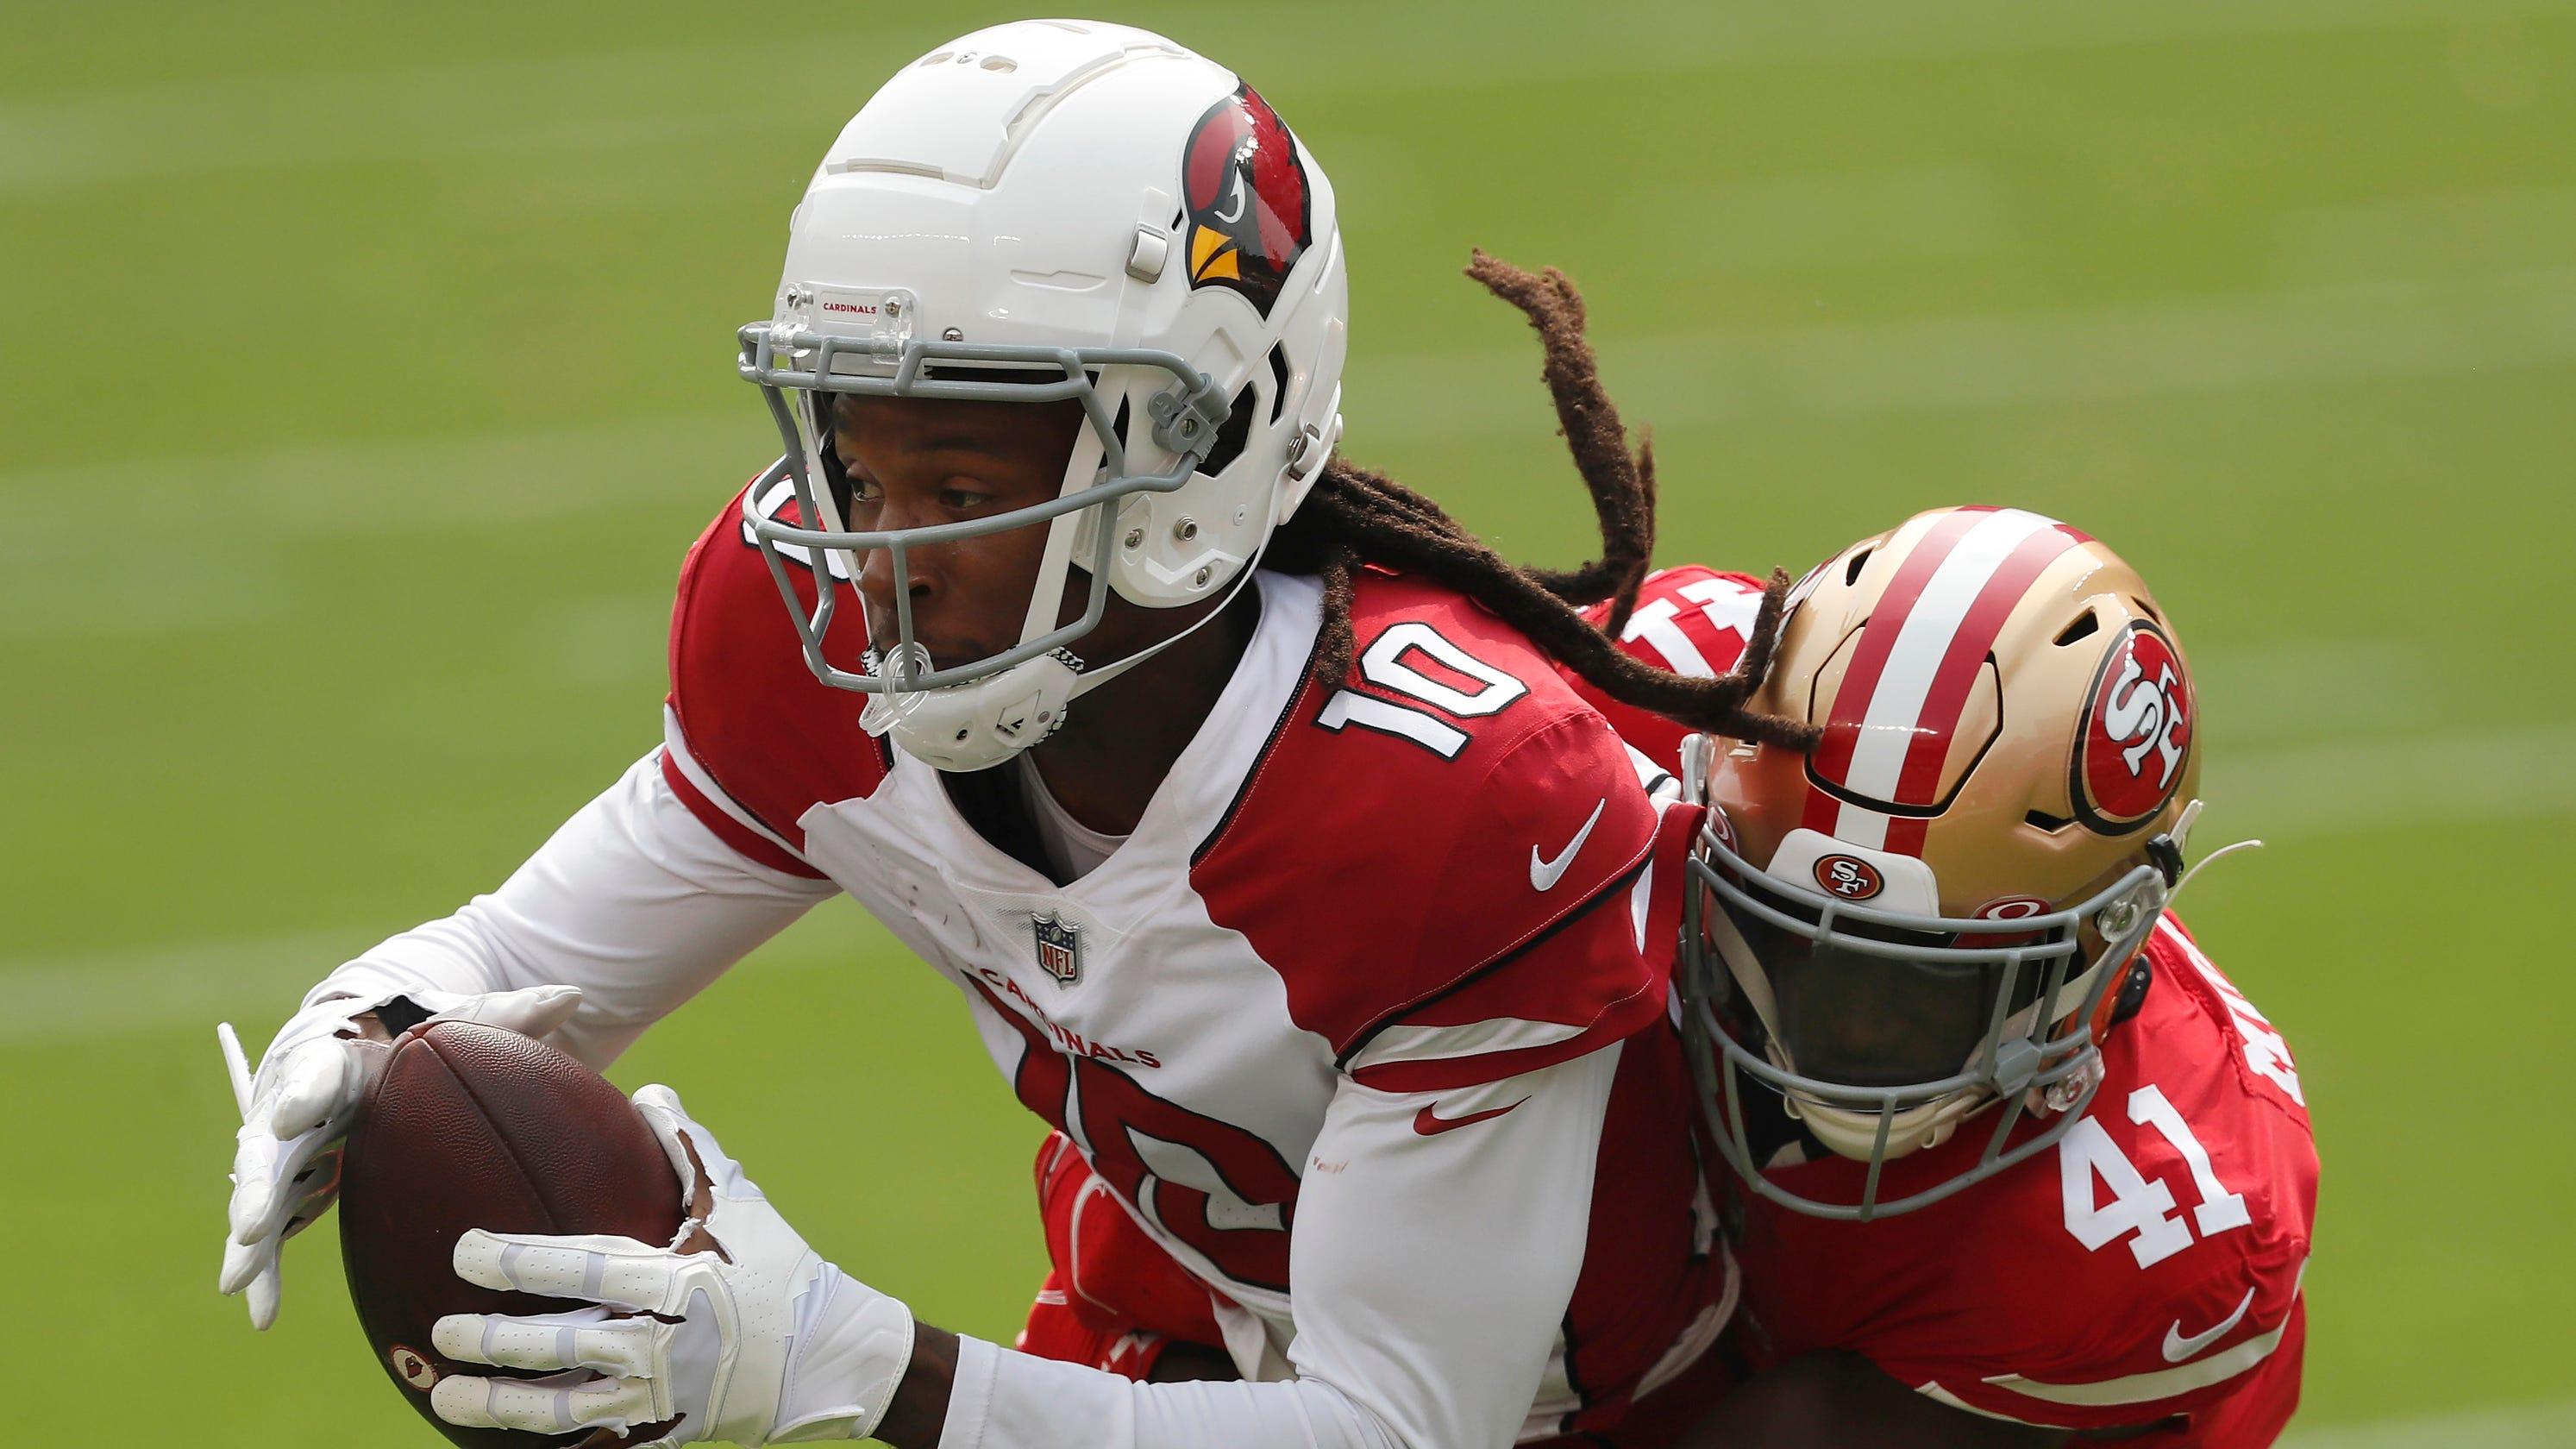 DeAndre Hopkins sparks Arizona Cardinals to upset of 49ers